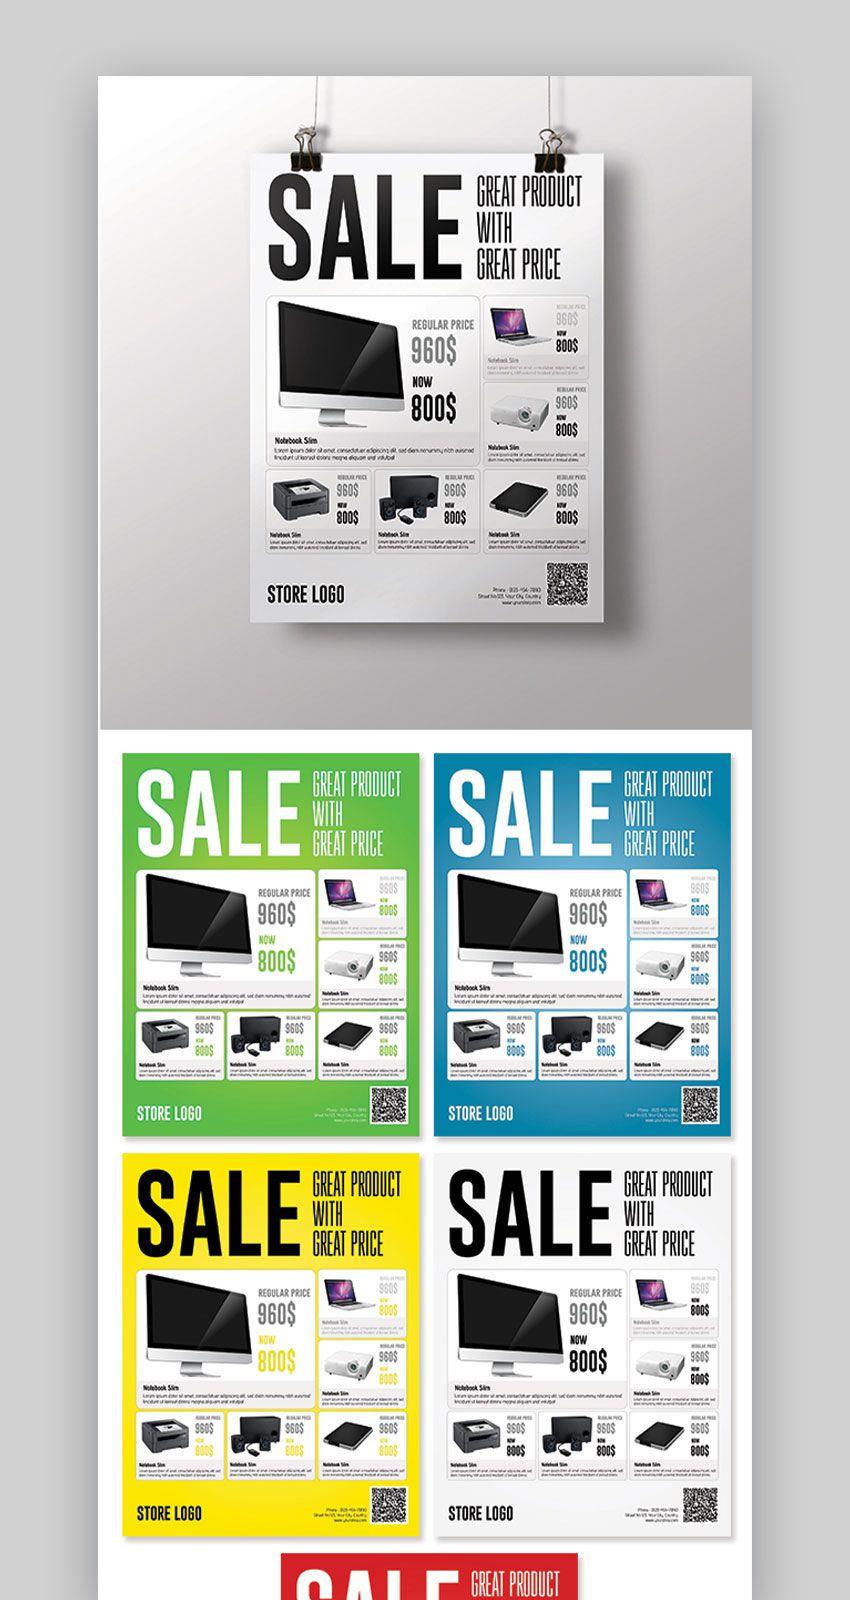 009 Stunning For Sale Flyer Template Idea  Car Ad Microsoft Word HouseFull